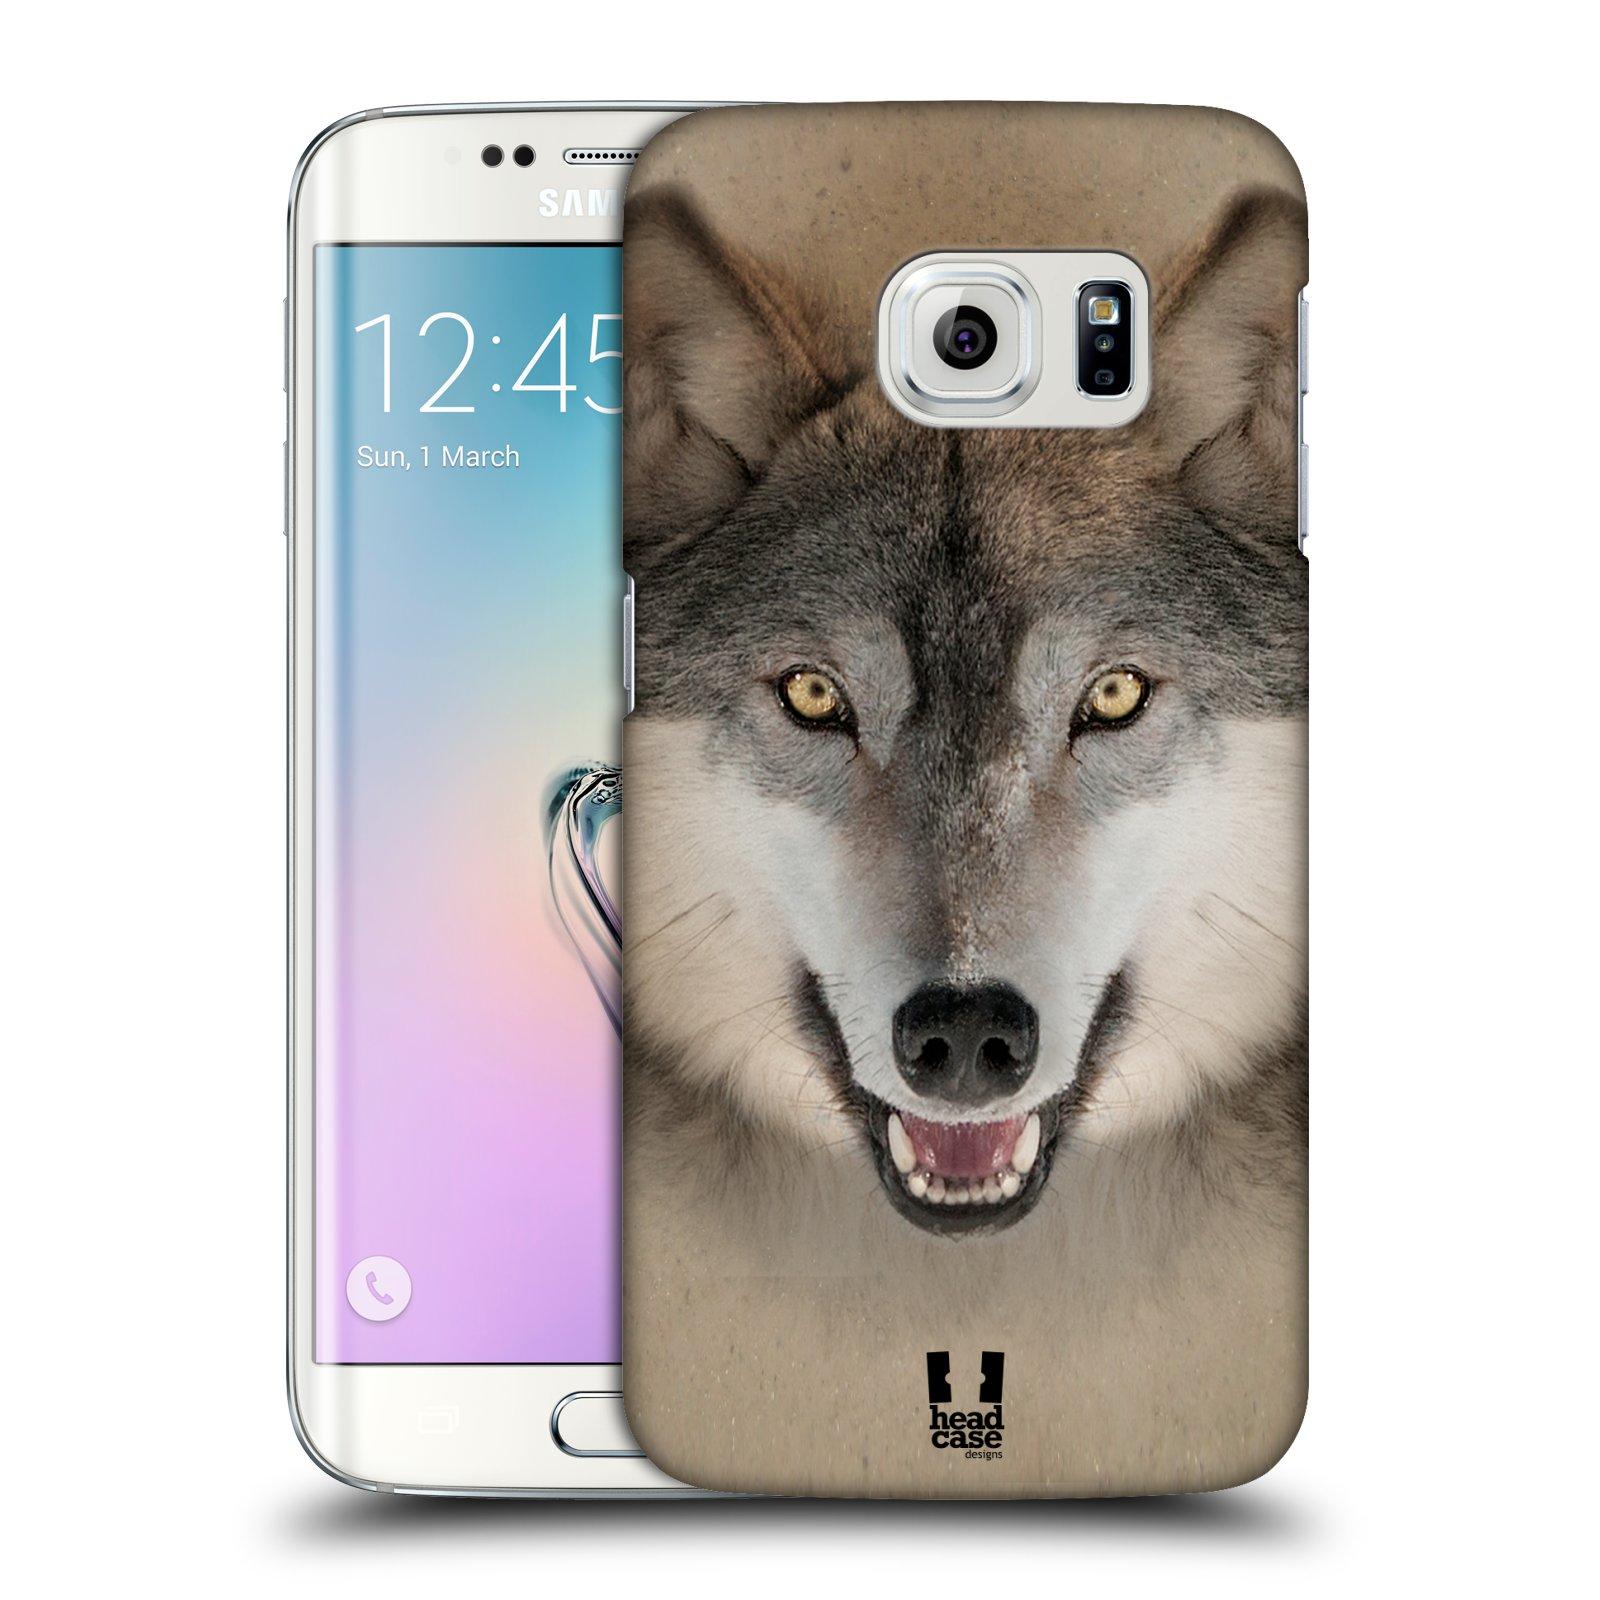 HEAD CASE plastový obal na mobil SAMSUNG Galaxy S6 EDGE (G9250, G925, G925F) vzor Zvířecí tváře 2 vlk šedý